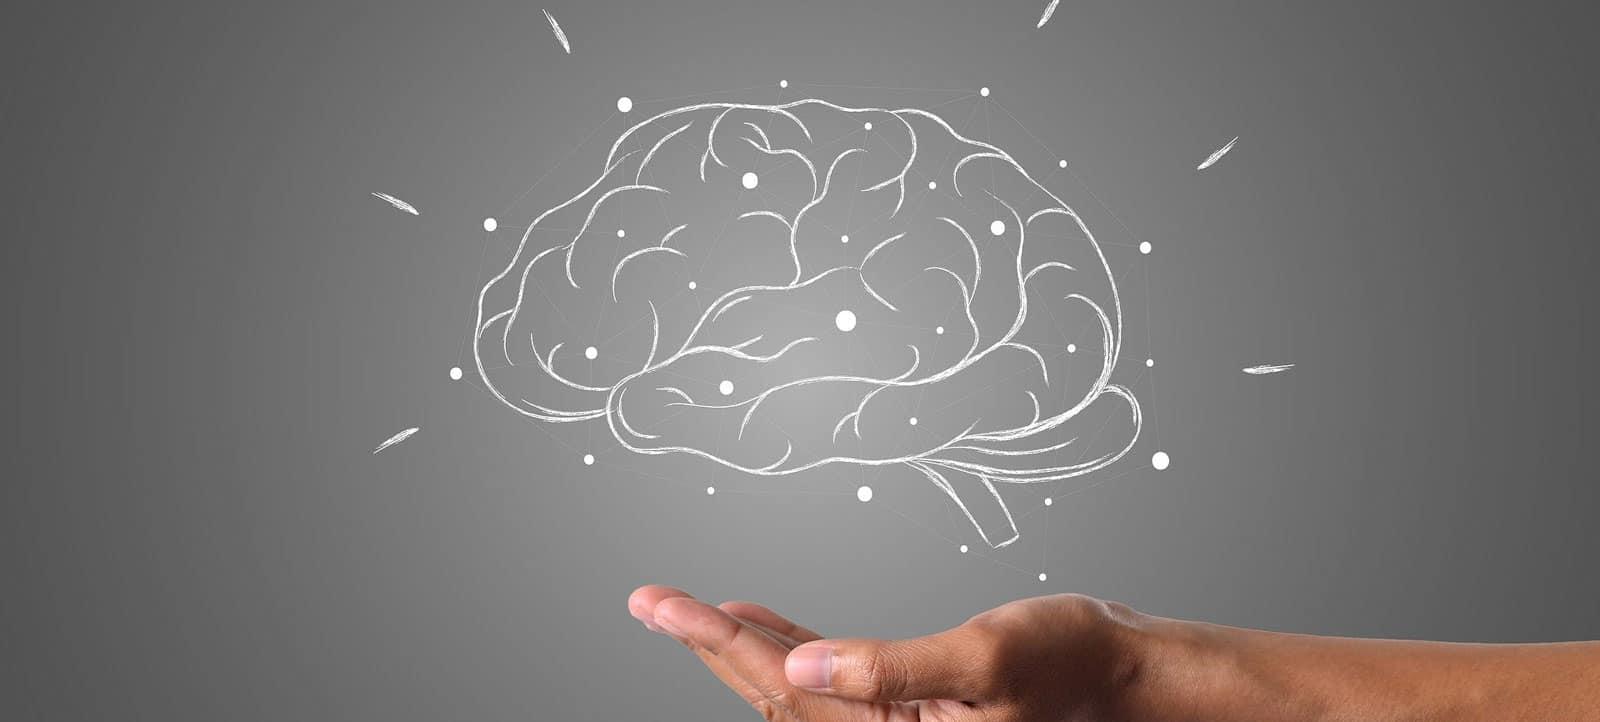 Endocrinology of Traumatic Brain Injury